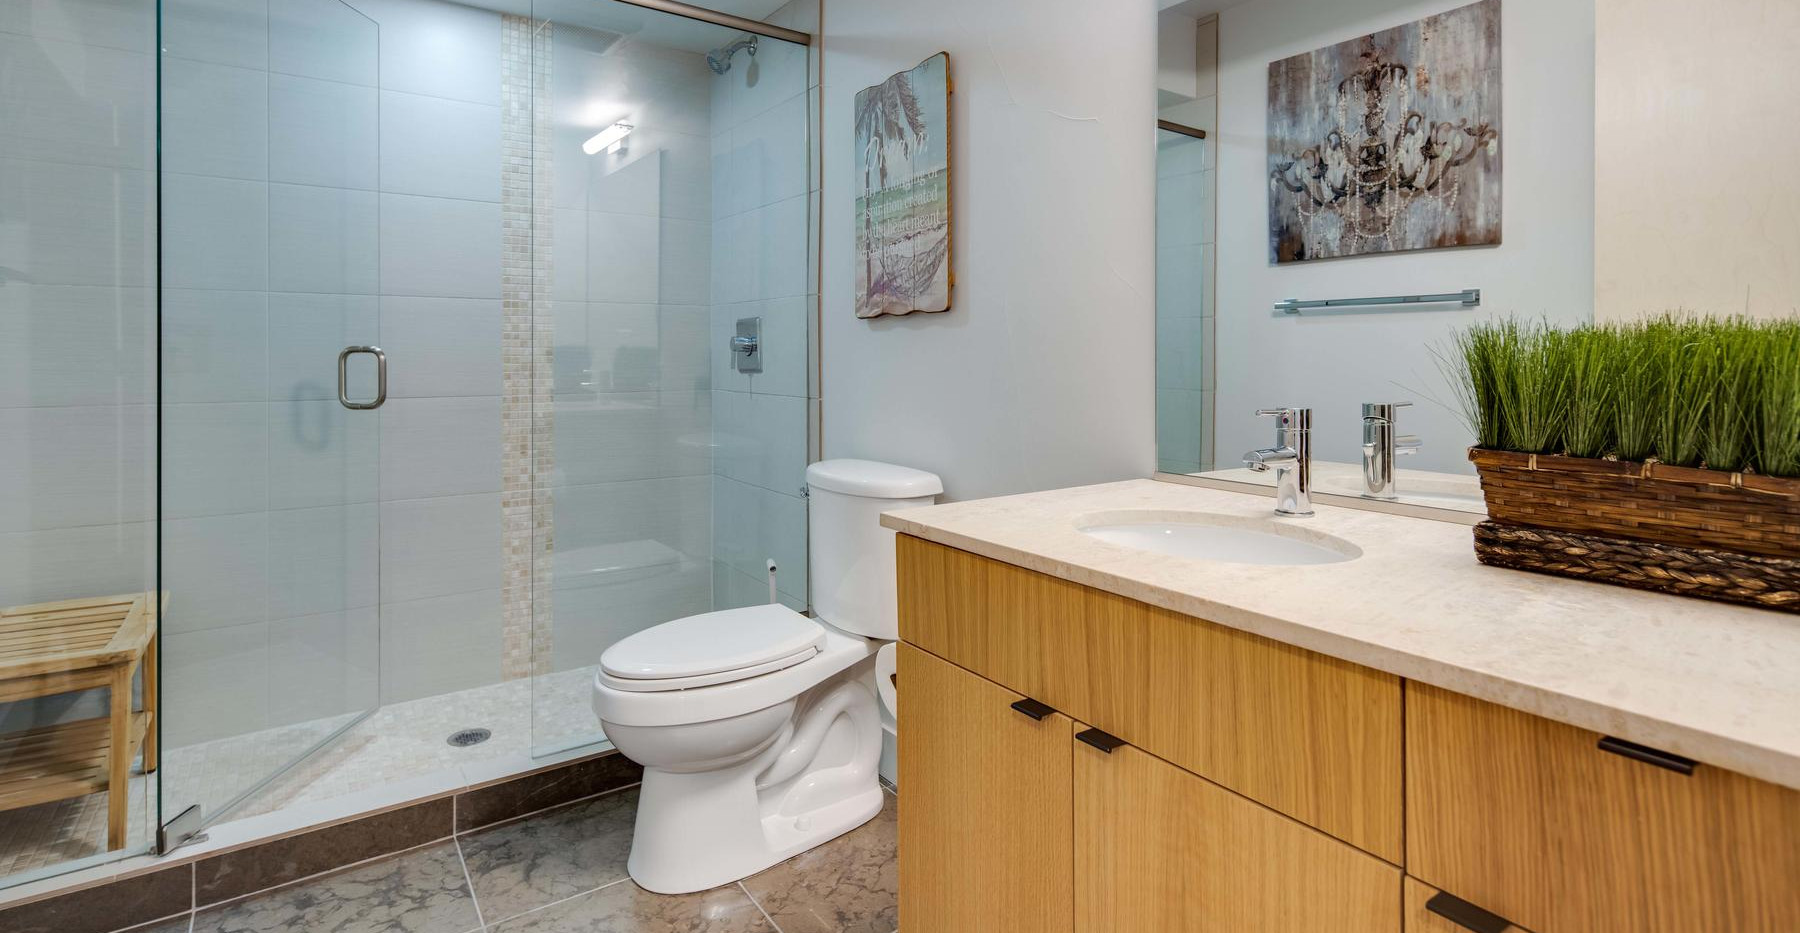 3434 Tejon Street-016-013-Bathroom-MLS_S